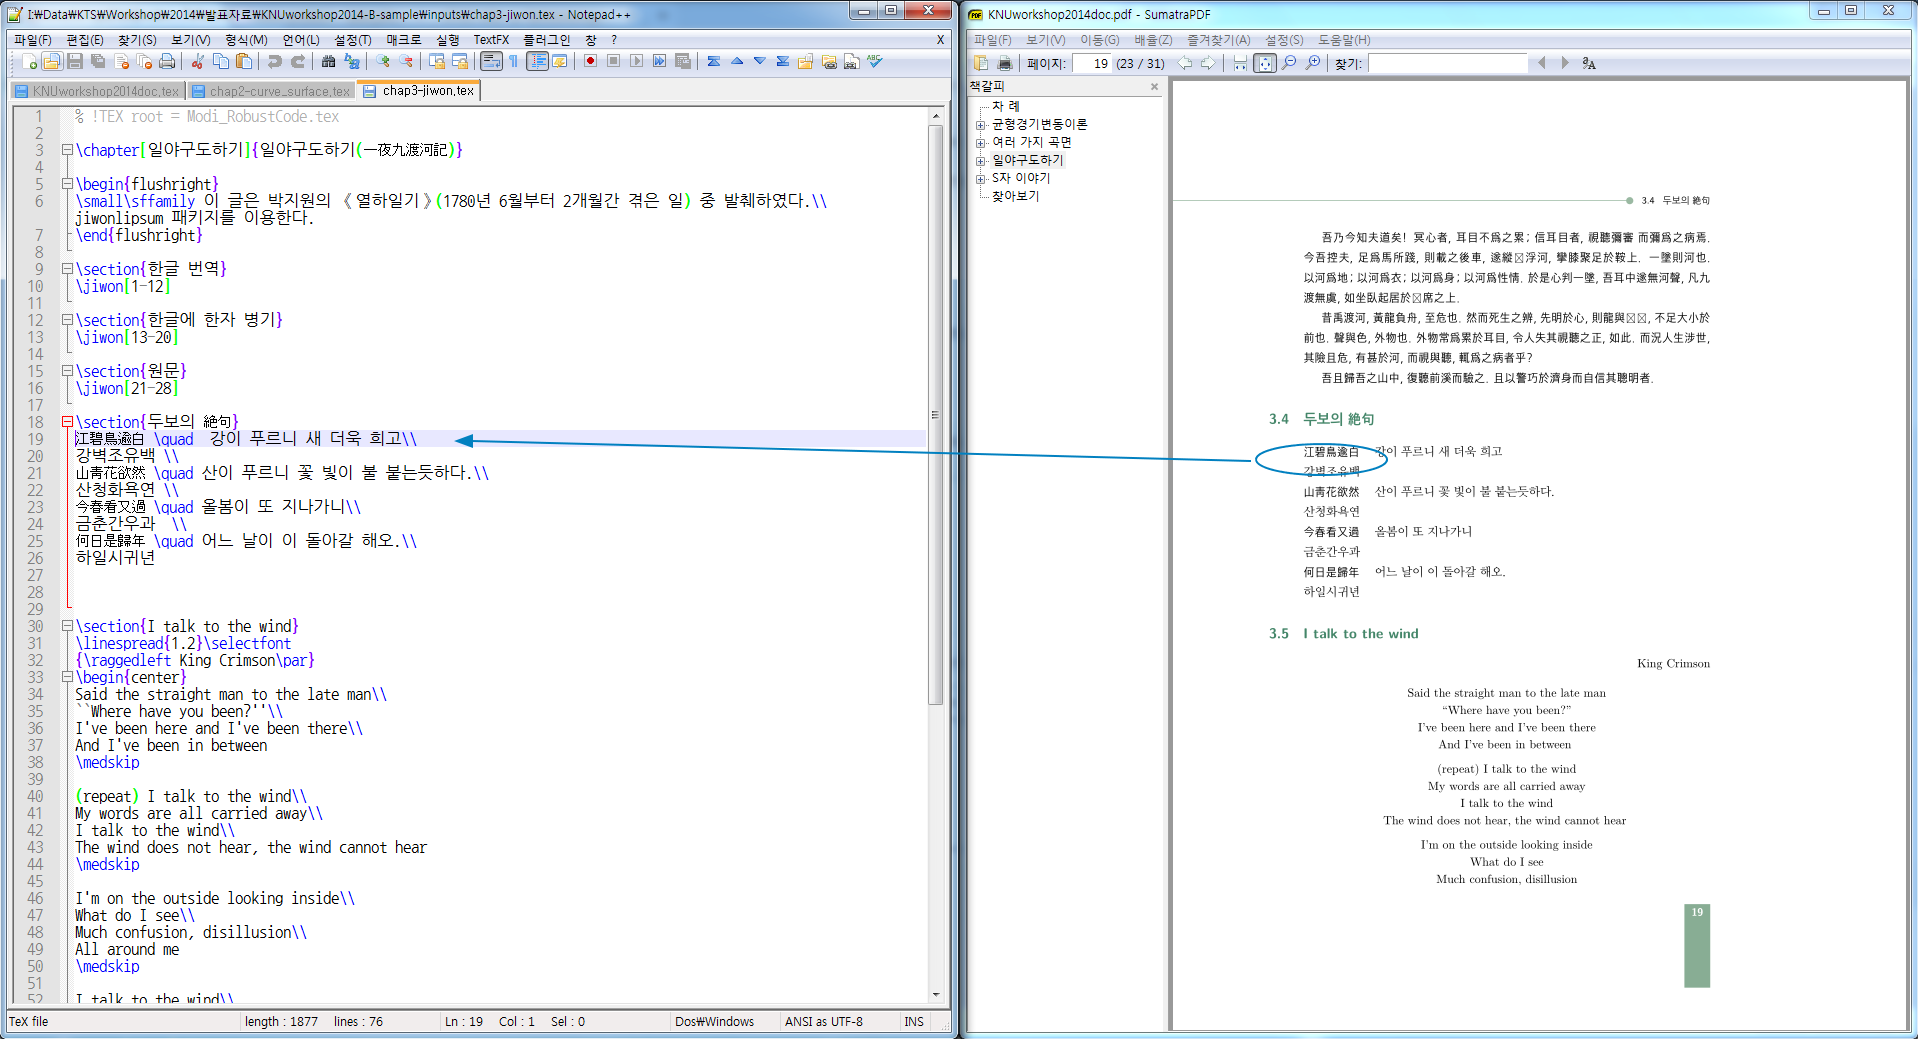 arara_test_in_windows7_KC2008++_screenshot.png